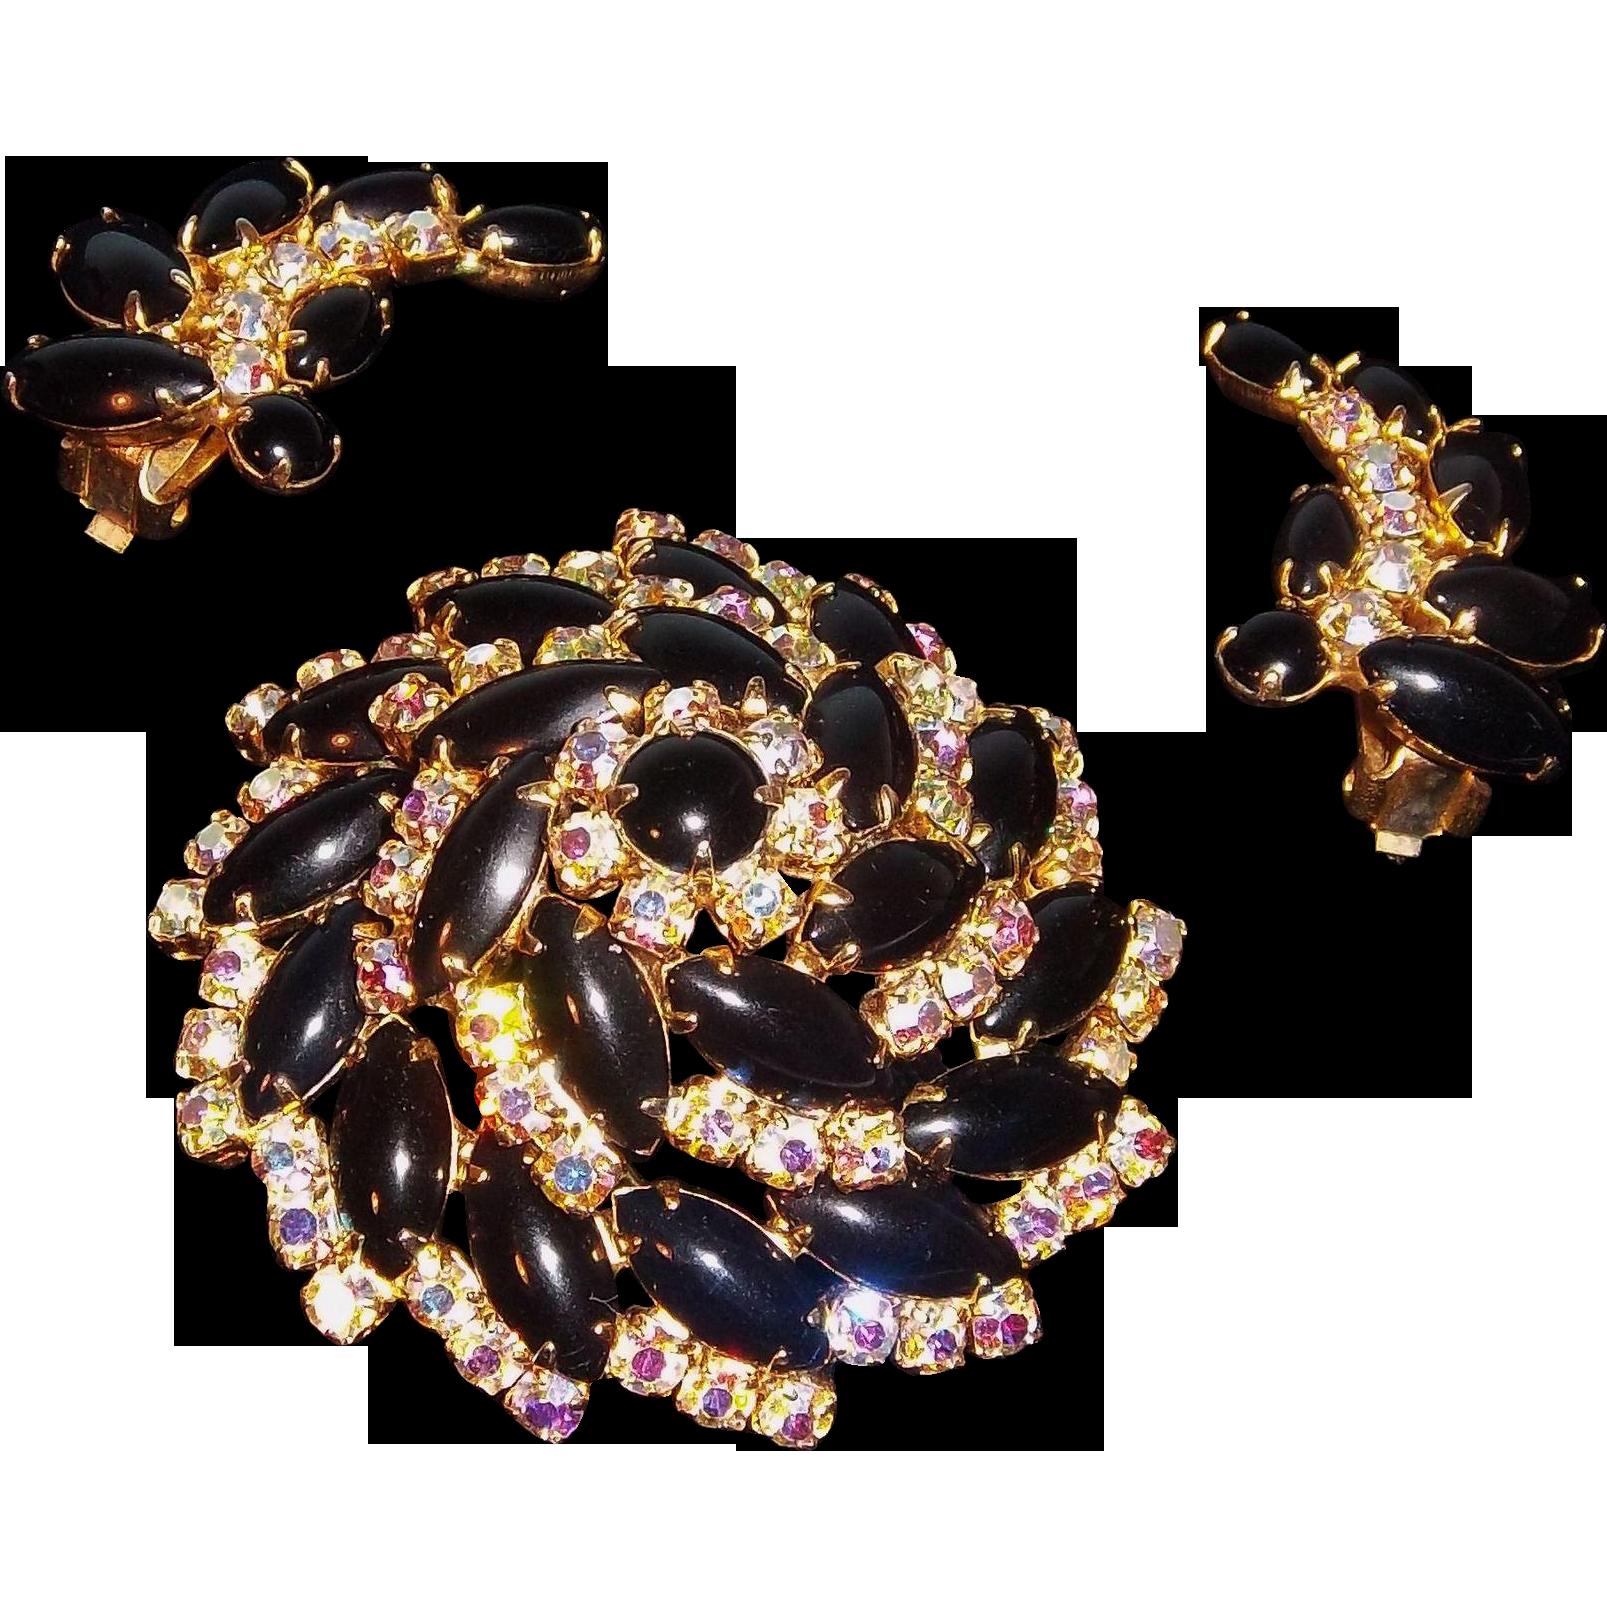 Glitzy  3-D Domed Brooch & Earring Set Black Cabs &  Aurora Borealis Rhinestones